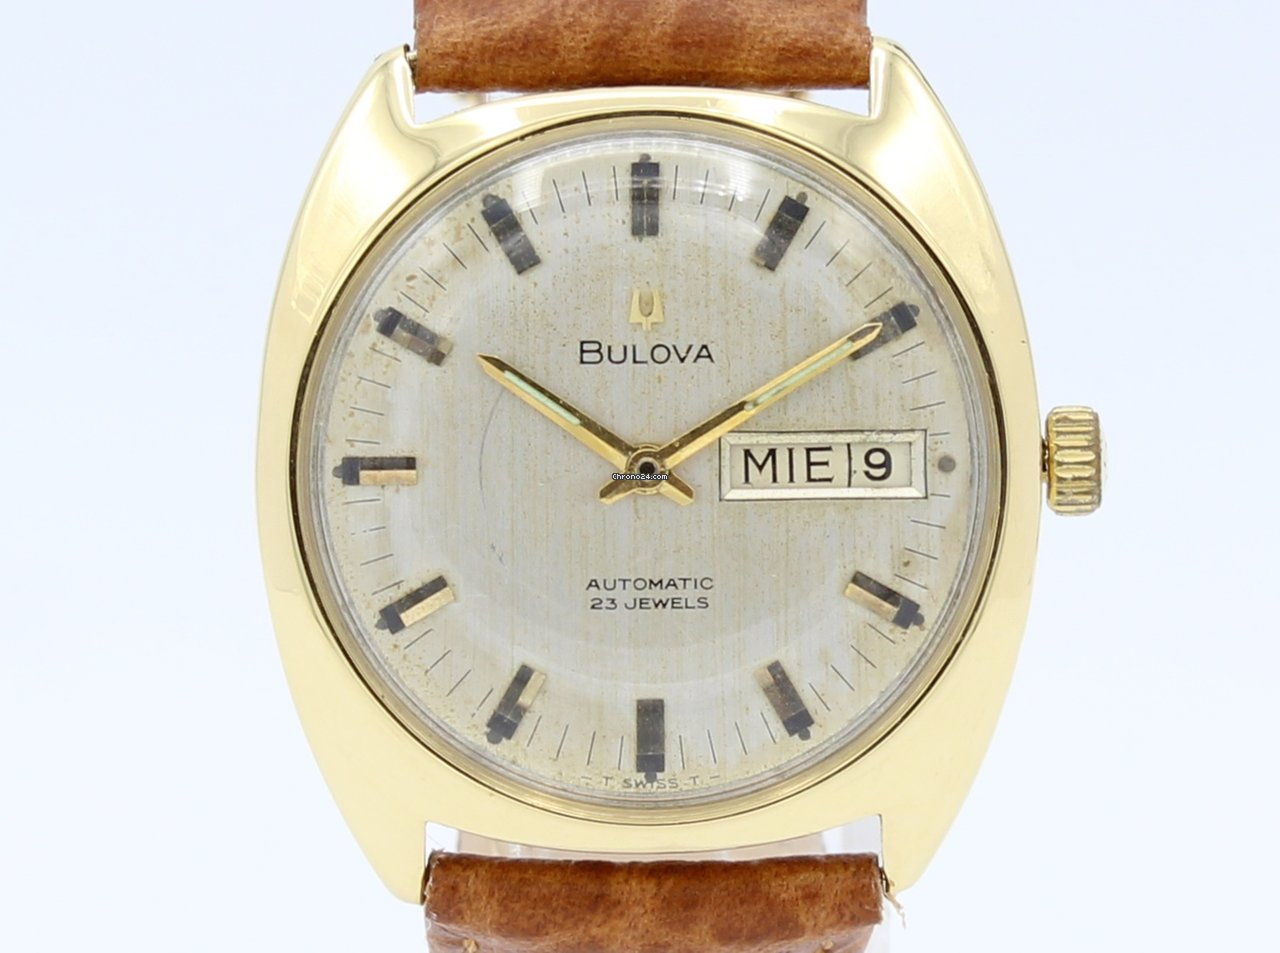 22d43382e Relojes Bulova Oro amarillo - Precios de todos los relojes Bulova Oro  amarillo en Chrono24